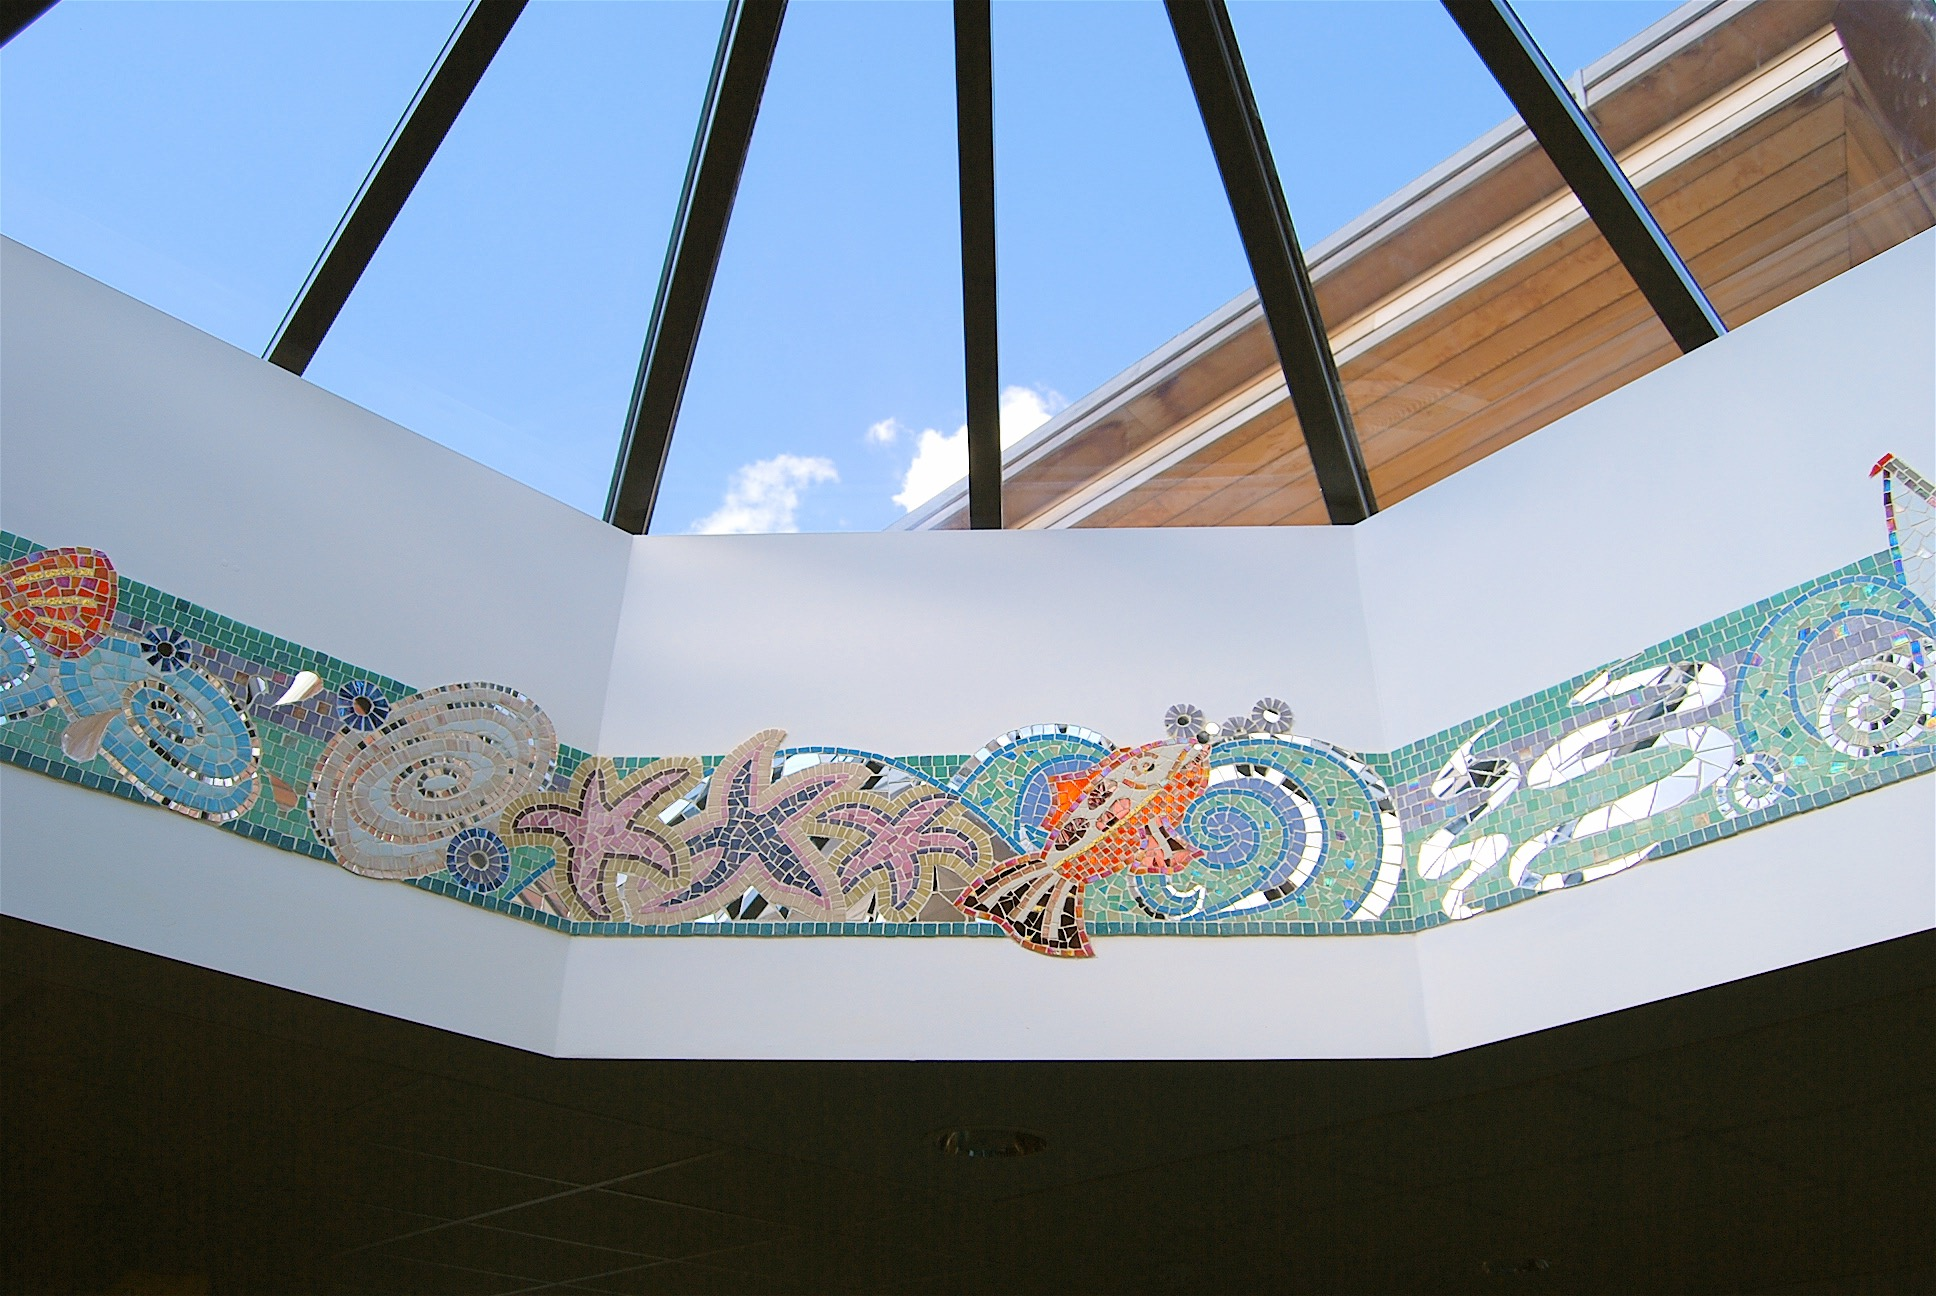 Mosaic Art in Schools